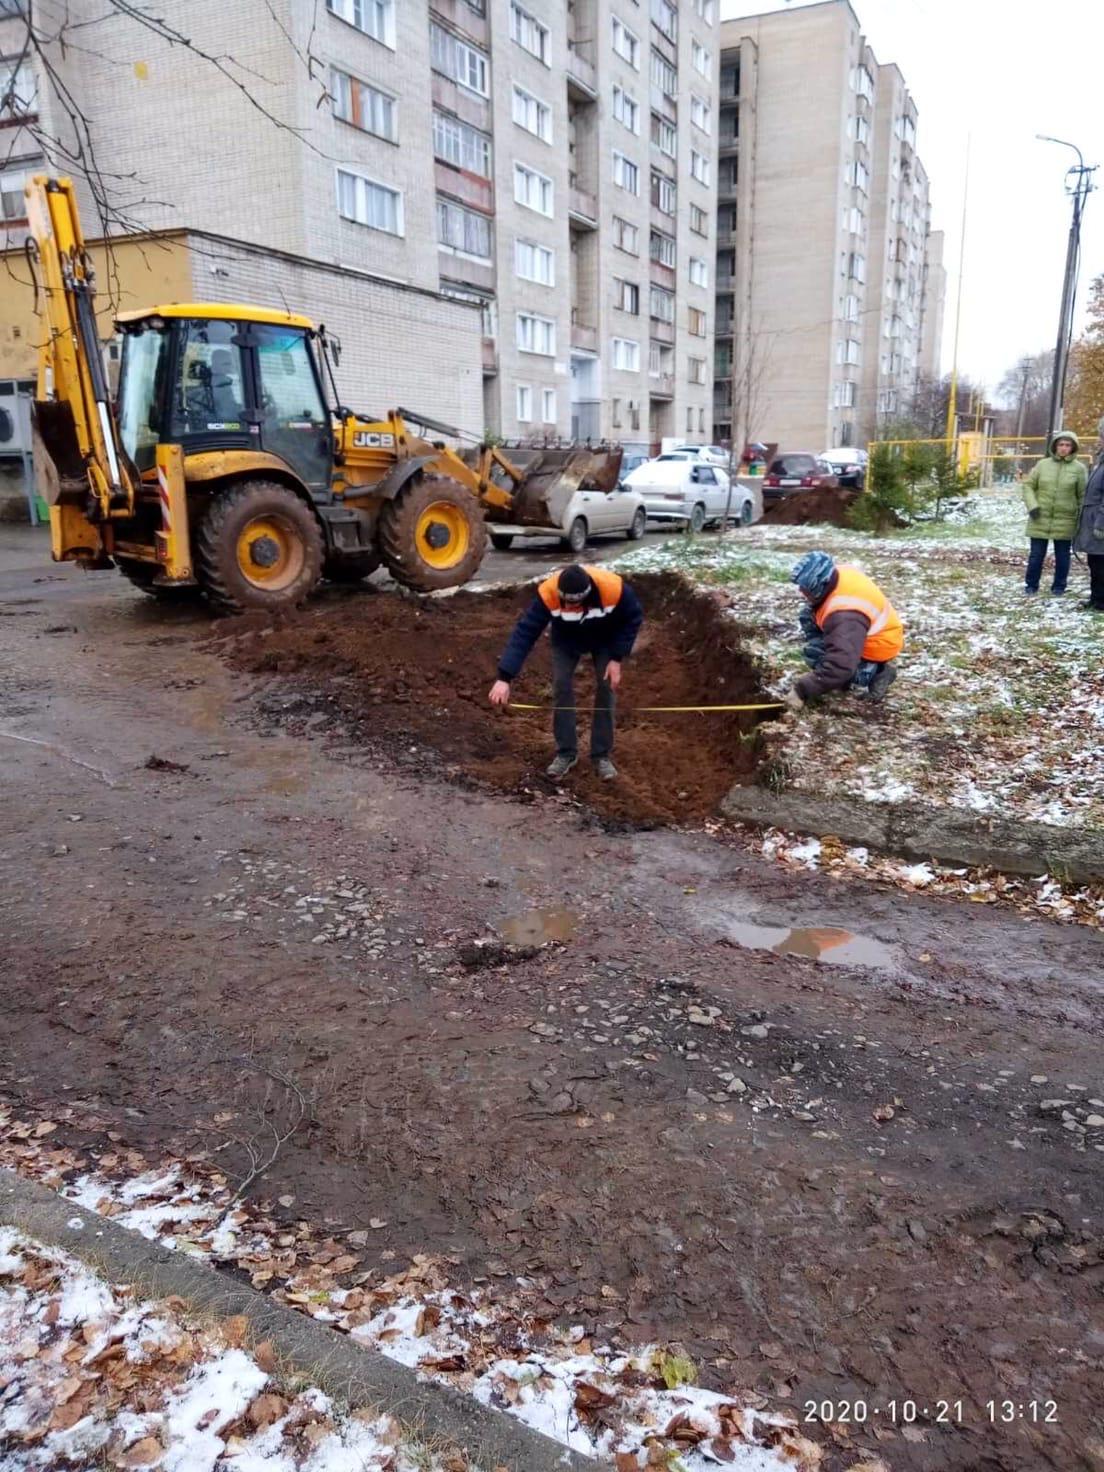 Ул. Р. Ердякова, 18. Подготовка участка для